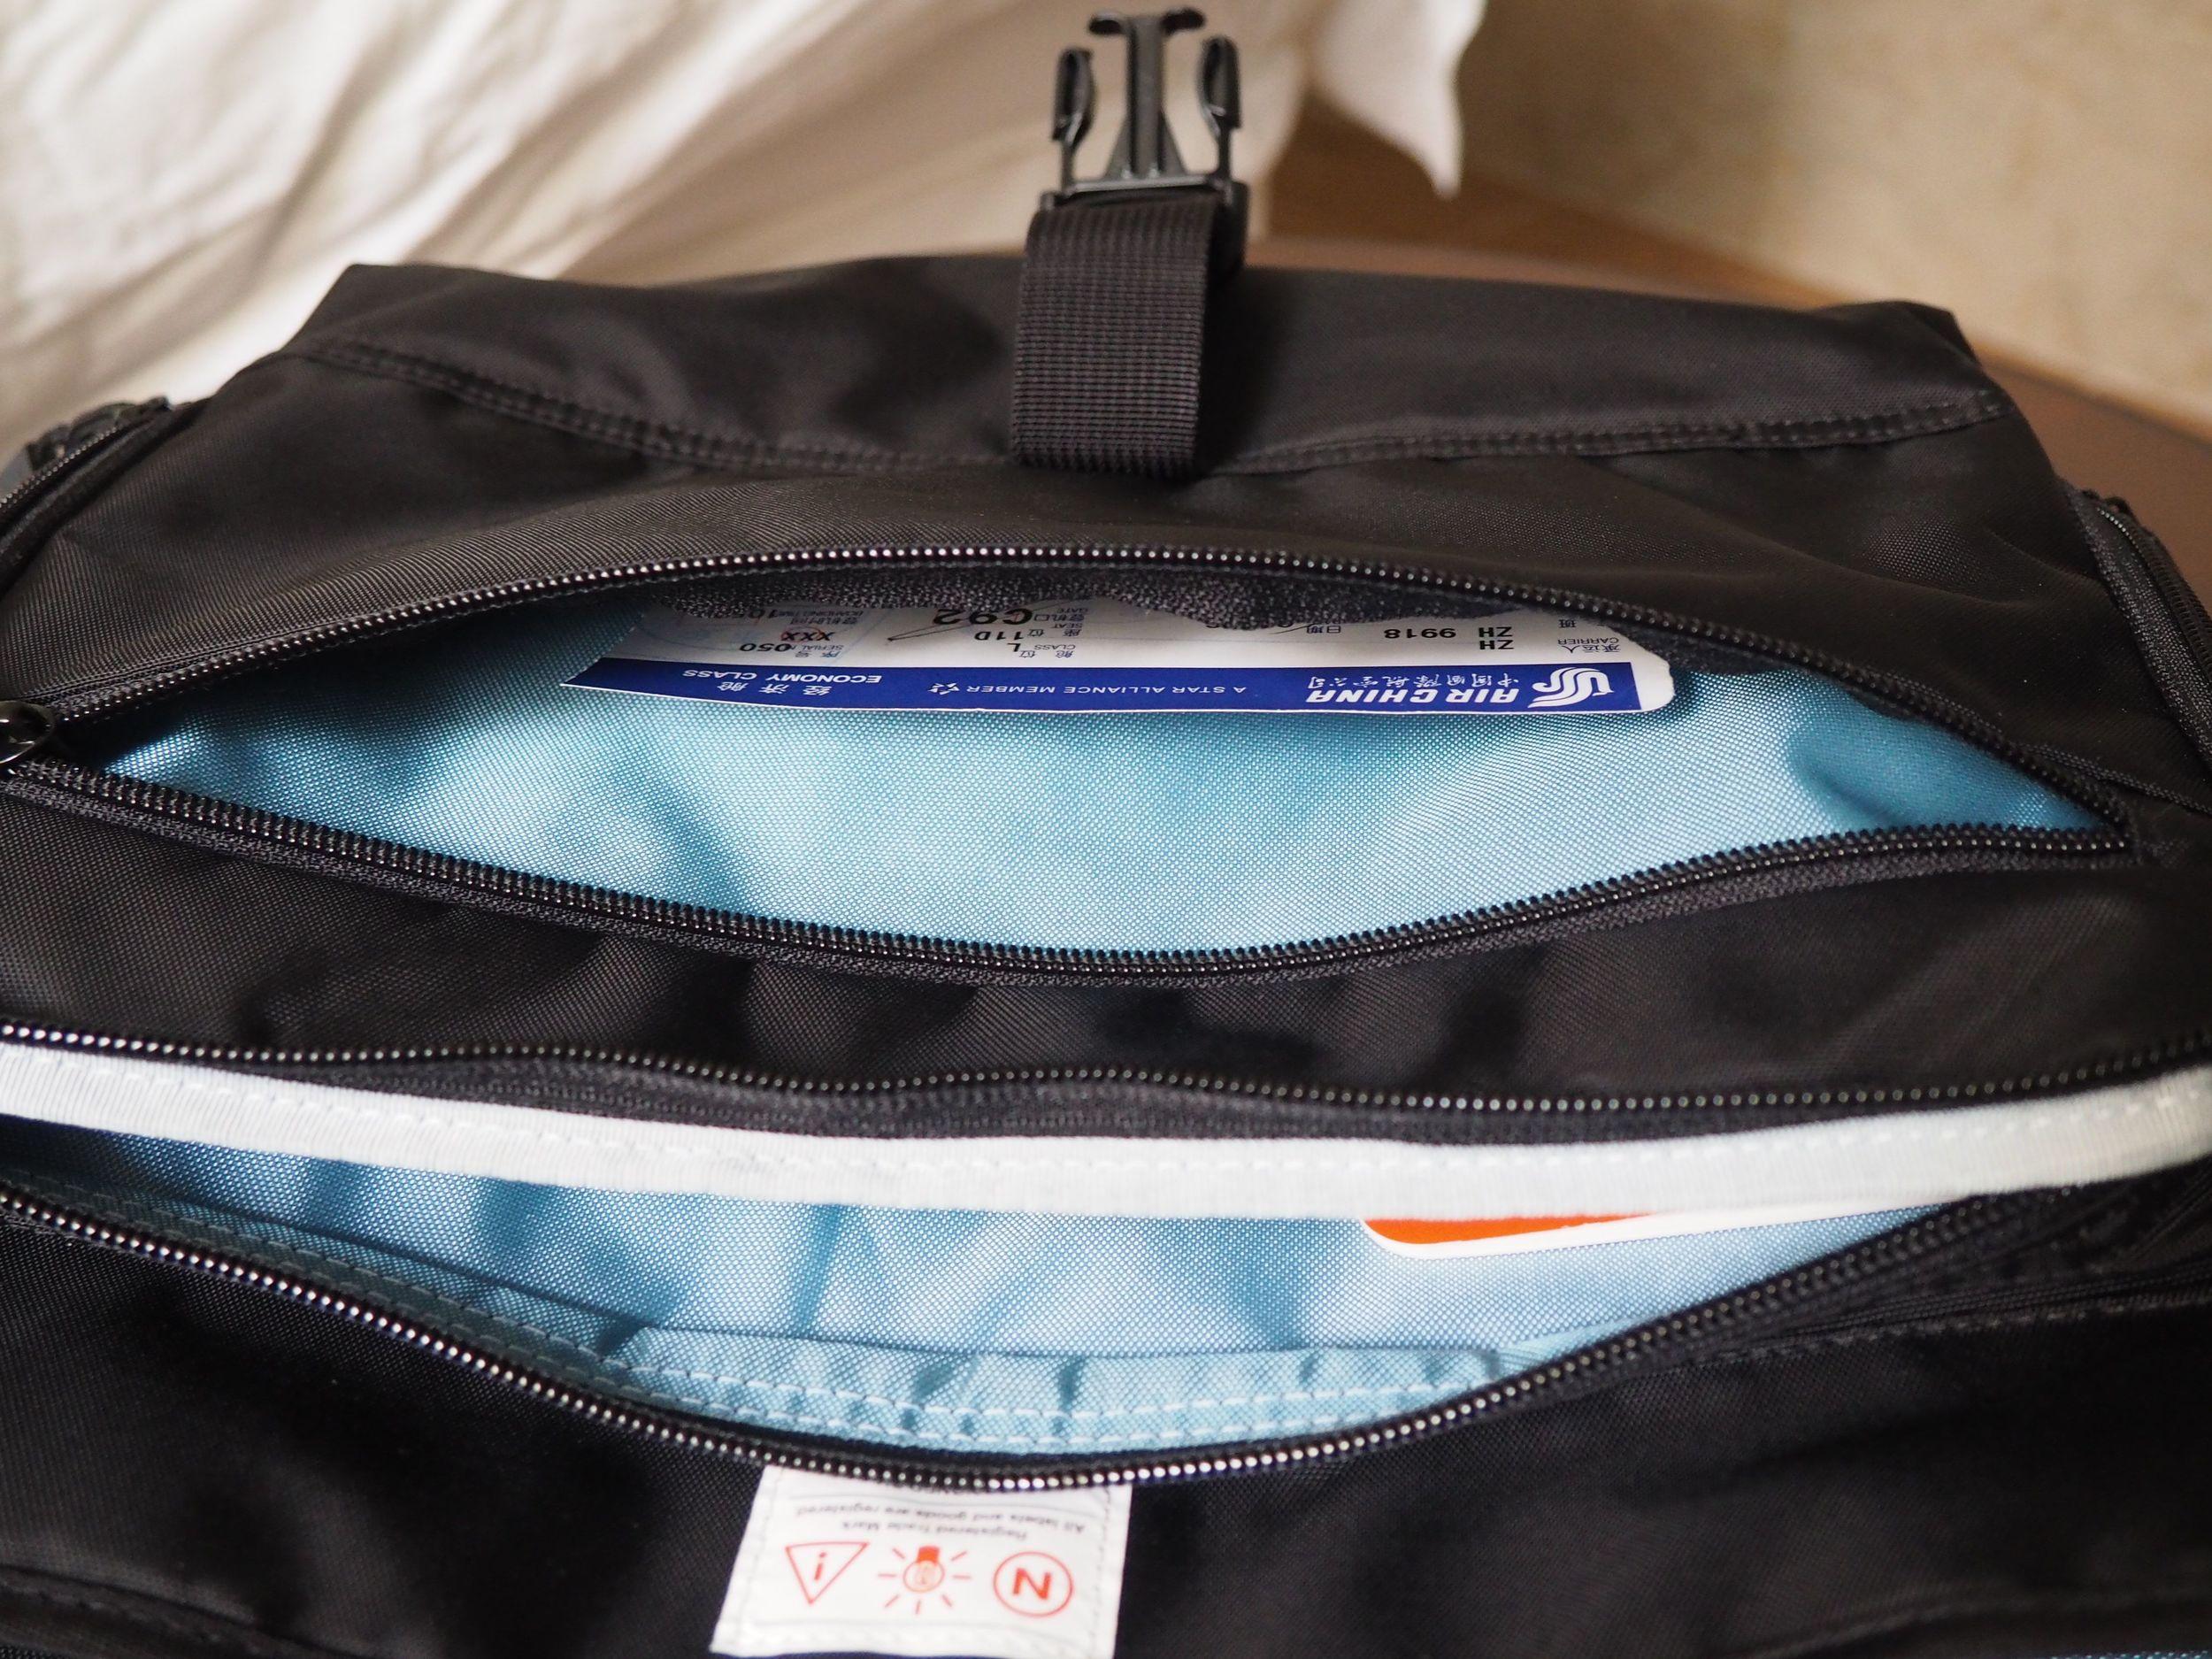 wise-walker OS-01 urban day bag front zip pocket